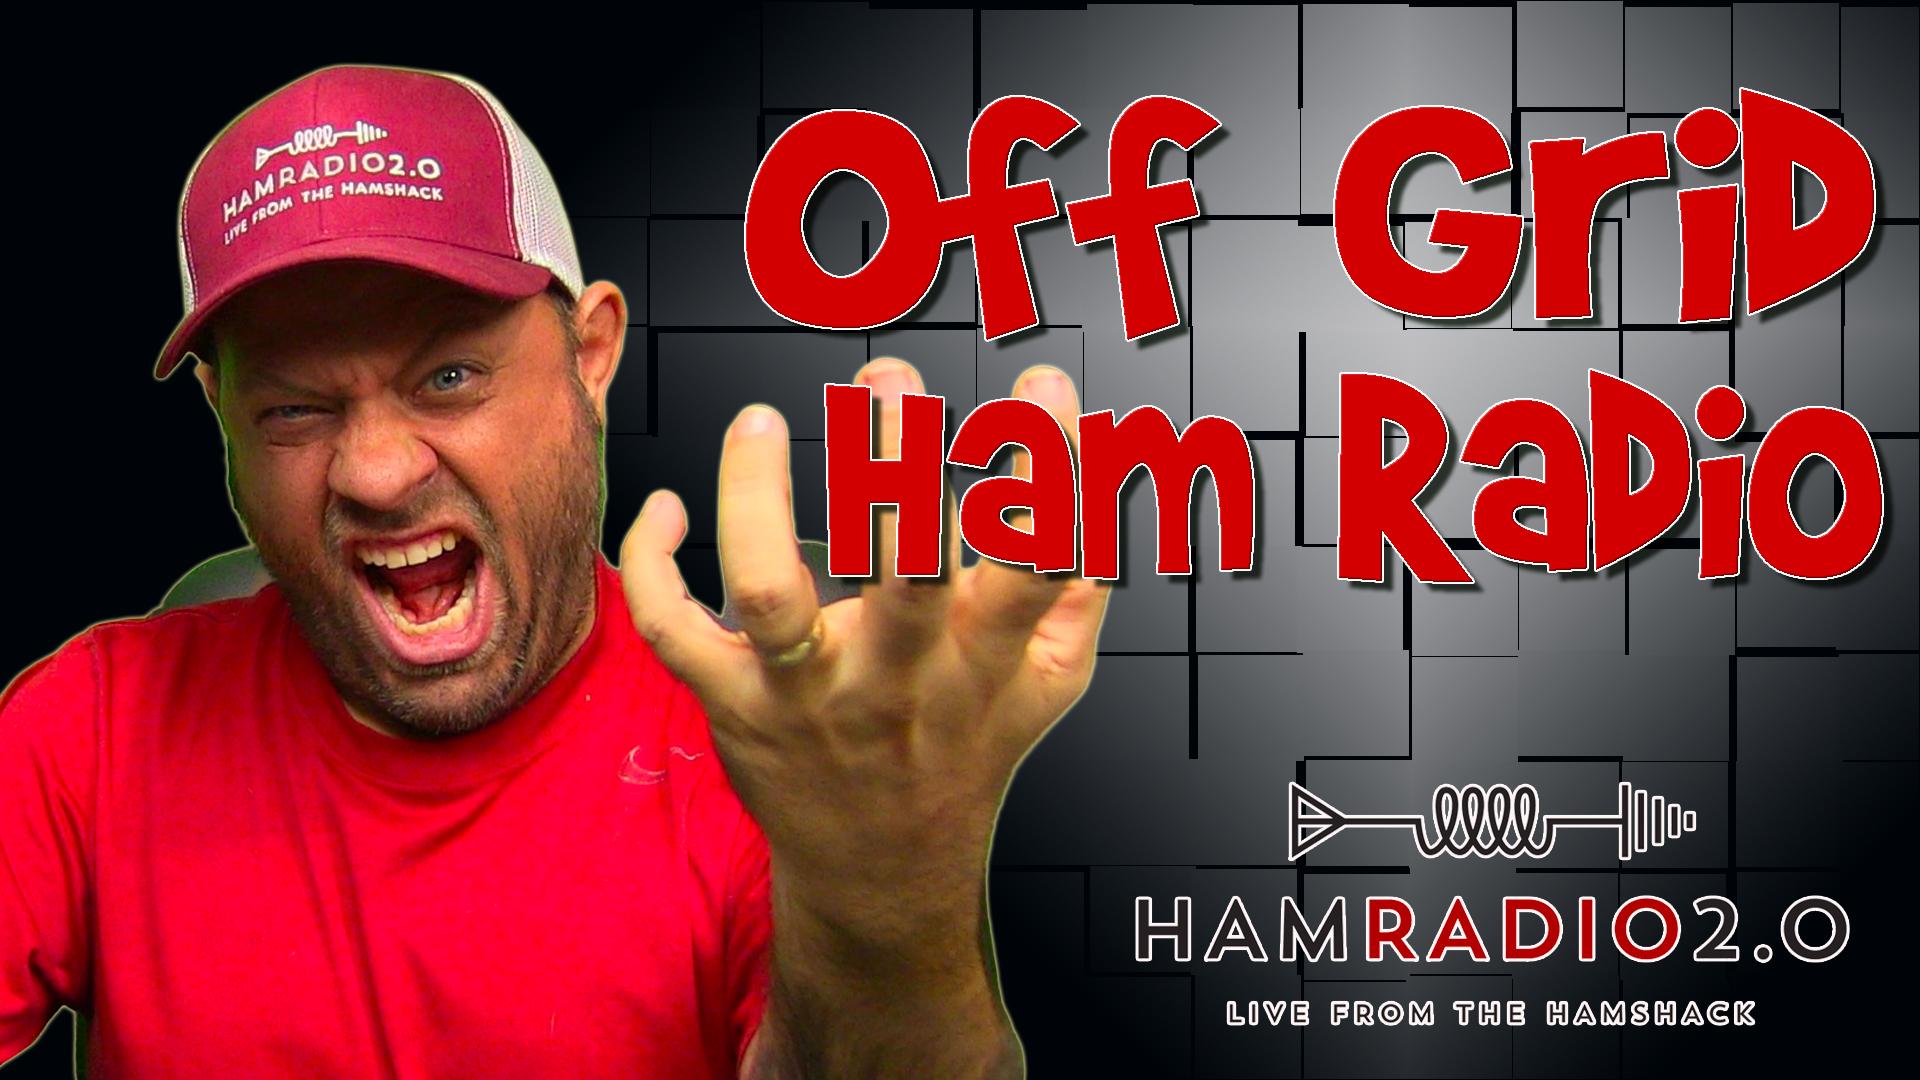 Episode 502: Best Handheld Ham Radio for Off Grid | Hunting – Survival Ham Radio